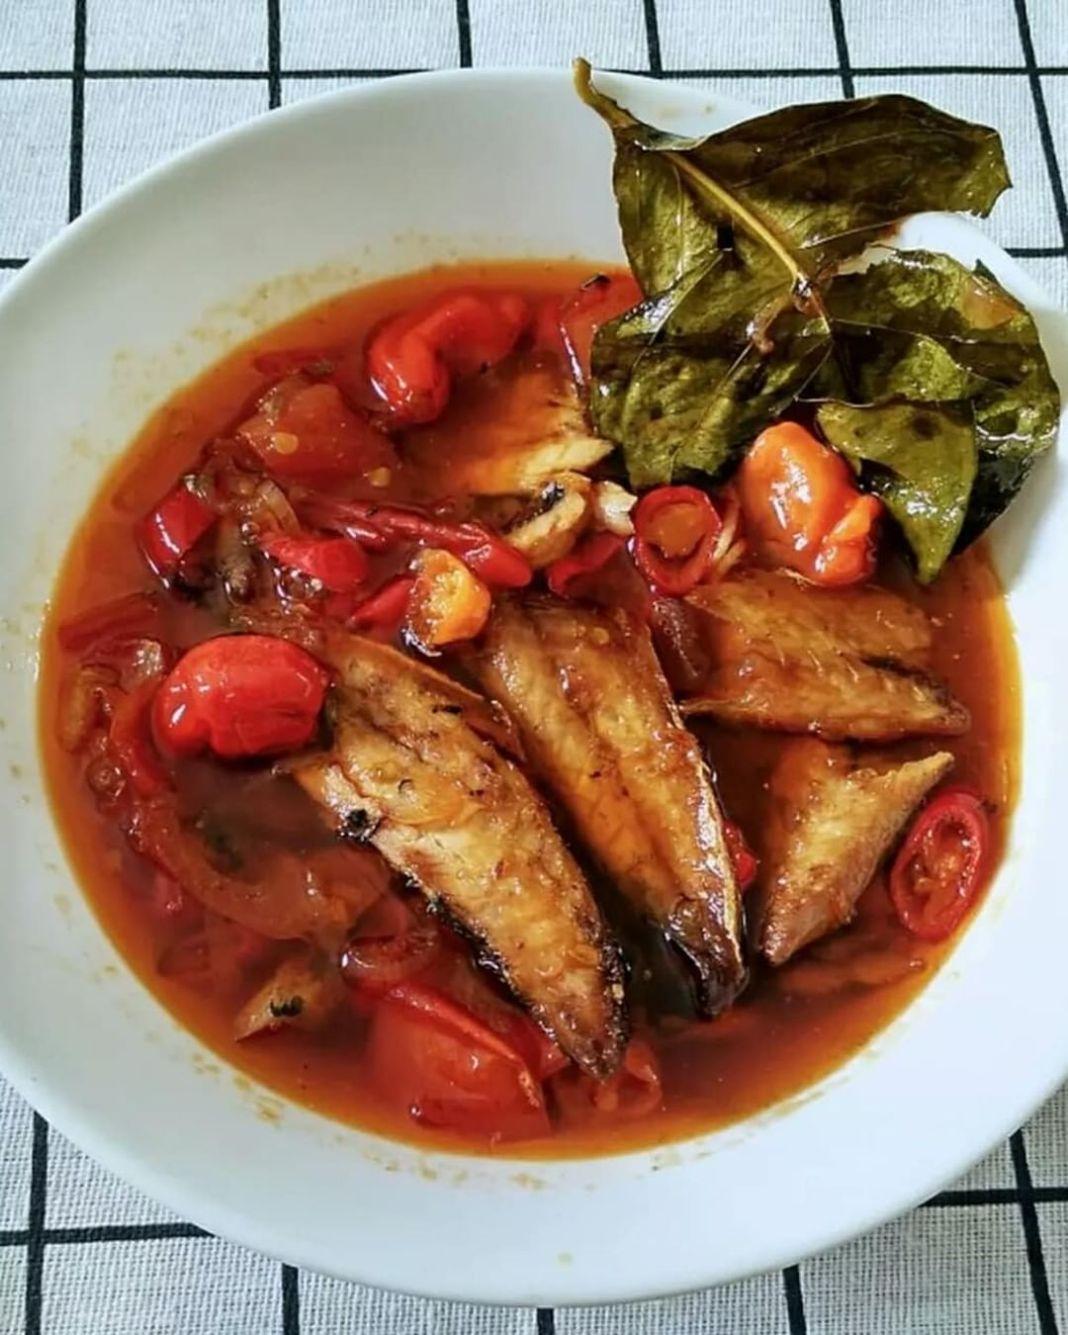 Info kuliner, SARDEN PINDANG HOMEMADE (2 porsi)  BAHAN : 4 ekor ikan pindang (cuci, buang kepala serta durinya)…